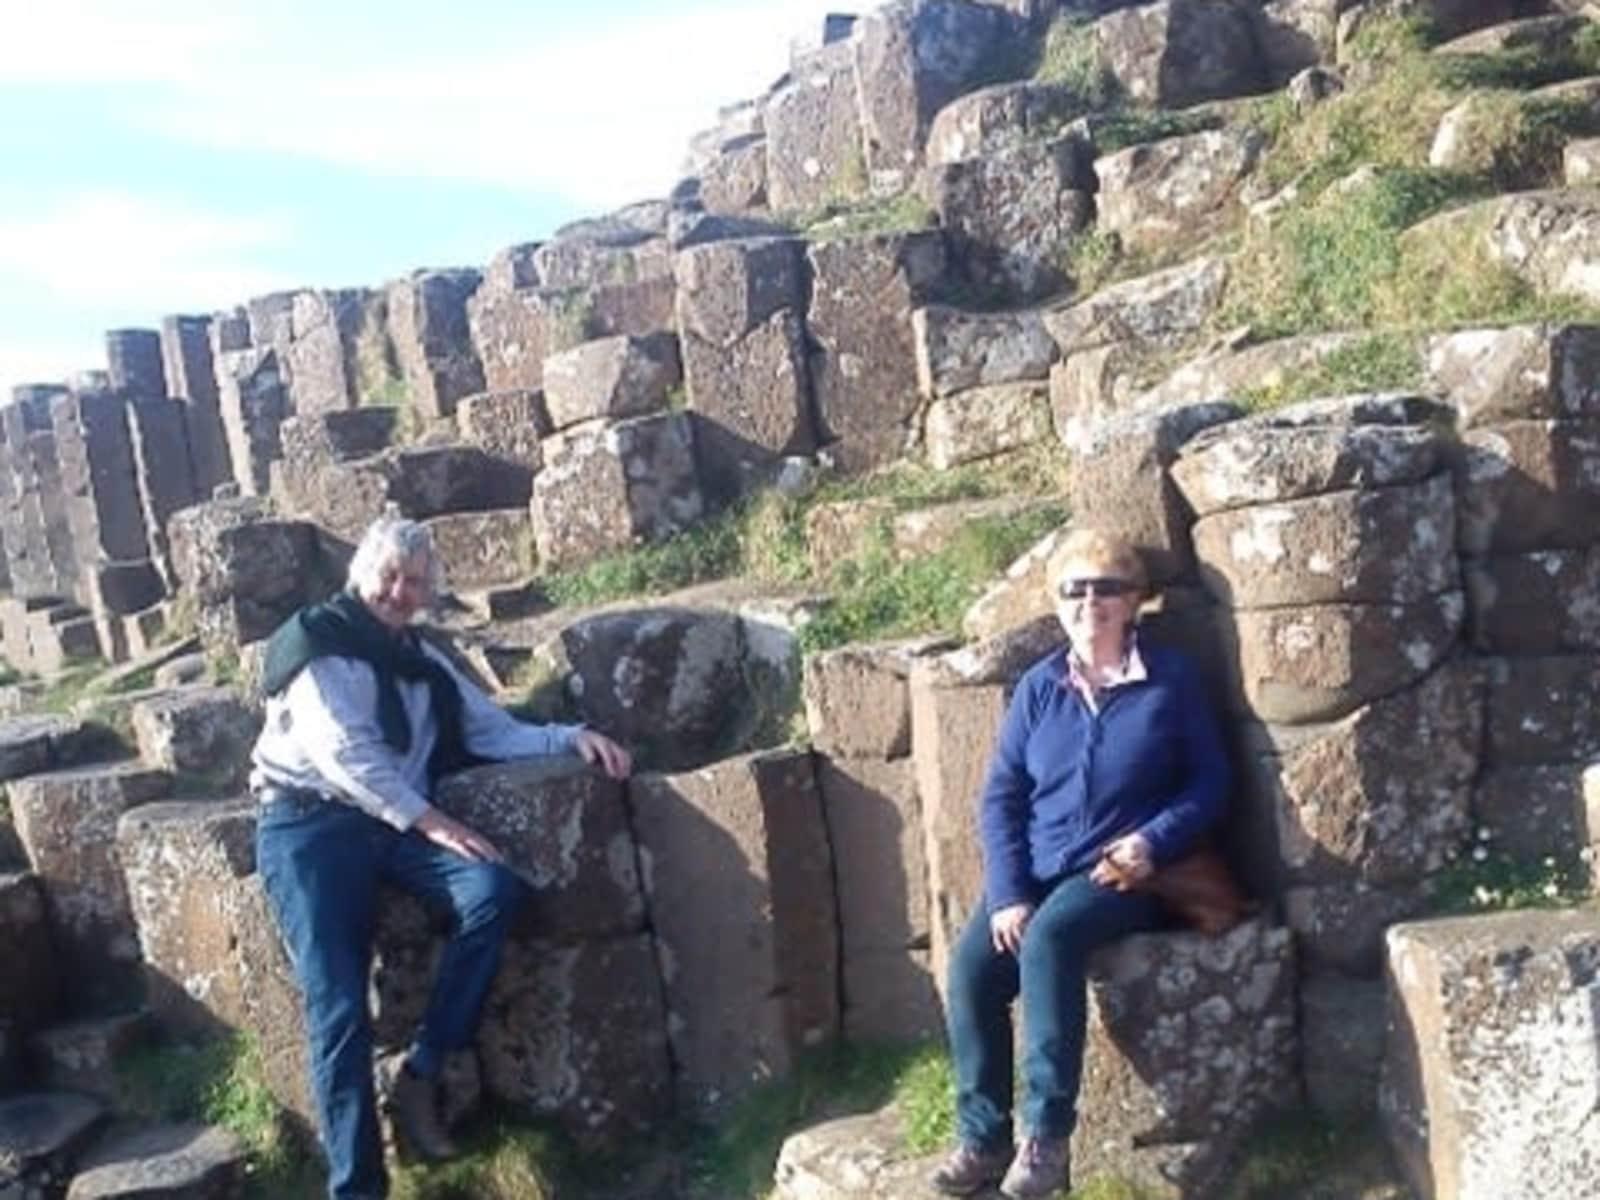 Anne & Paddy from Kilkenny, Ireland